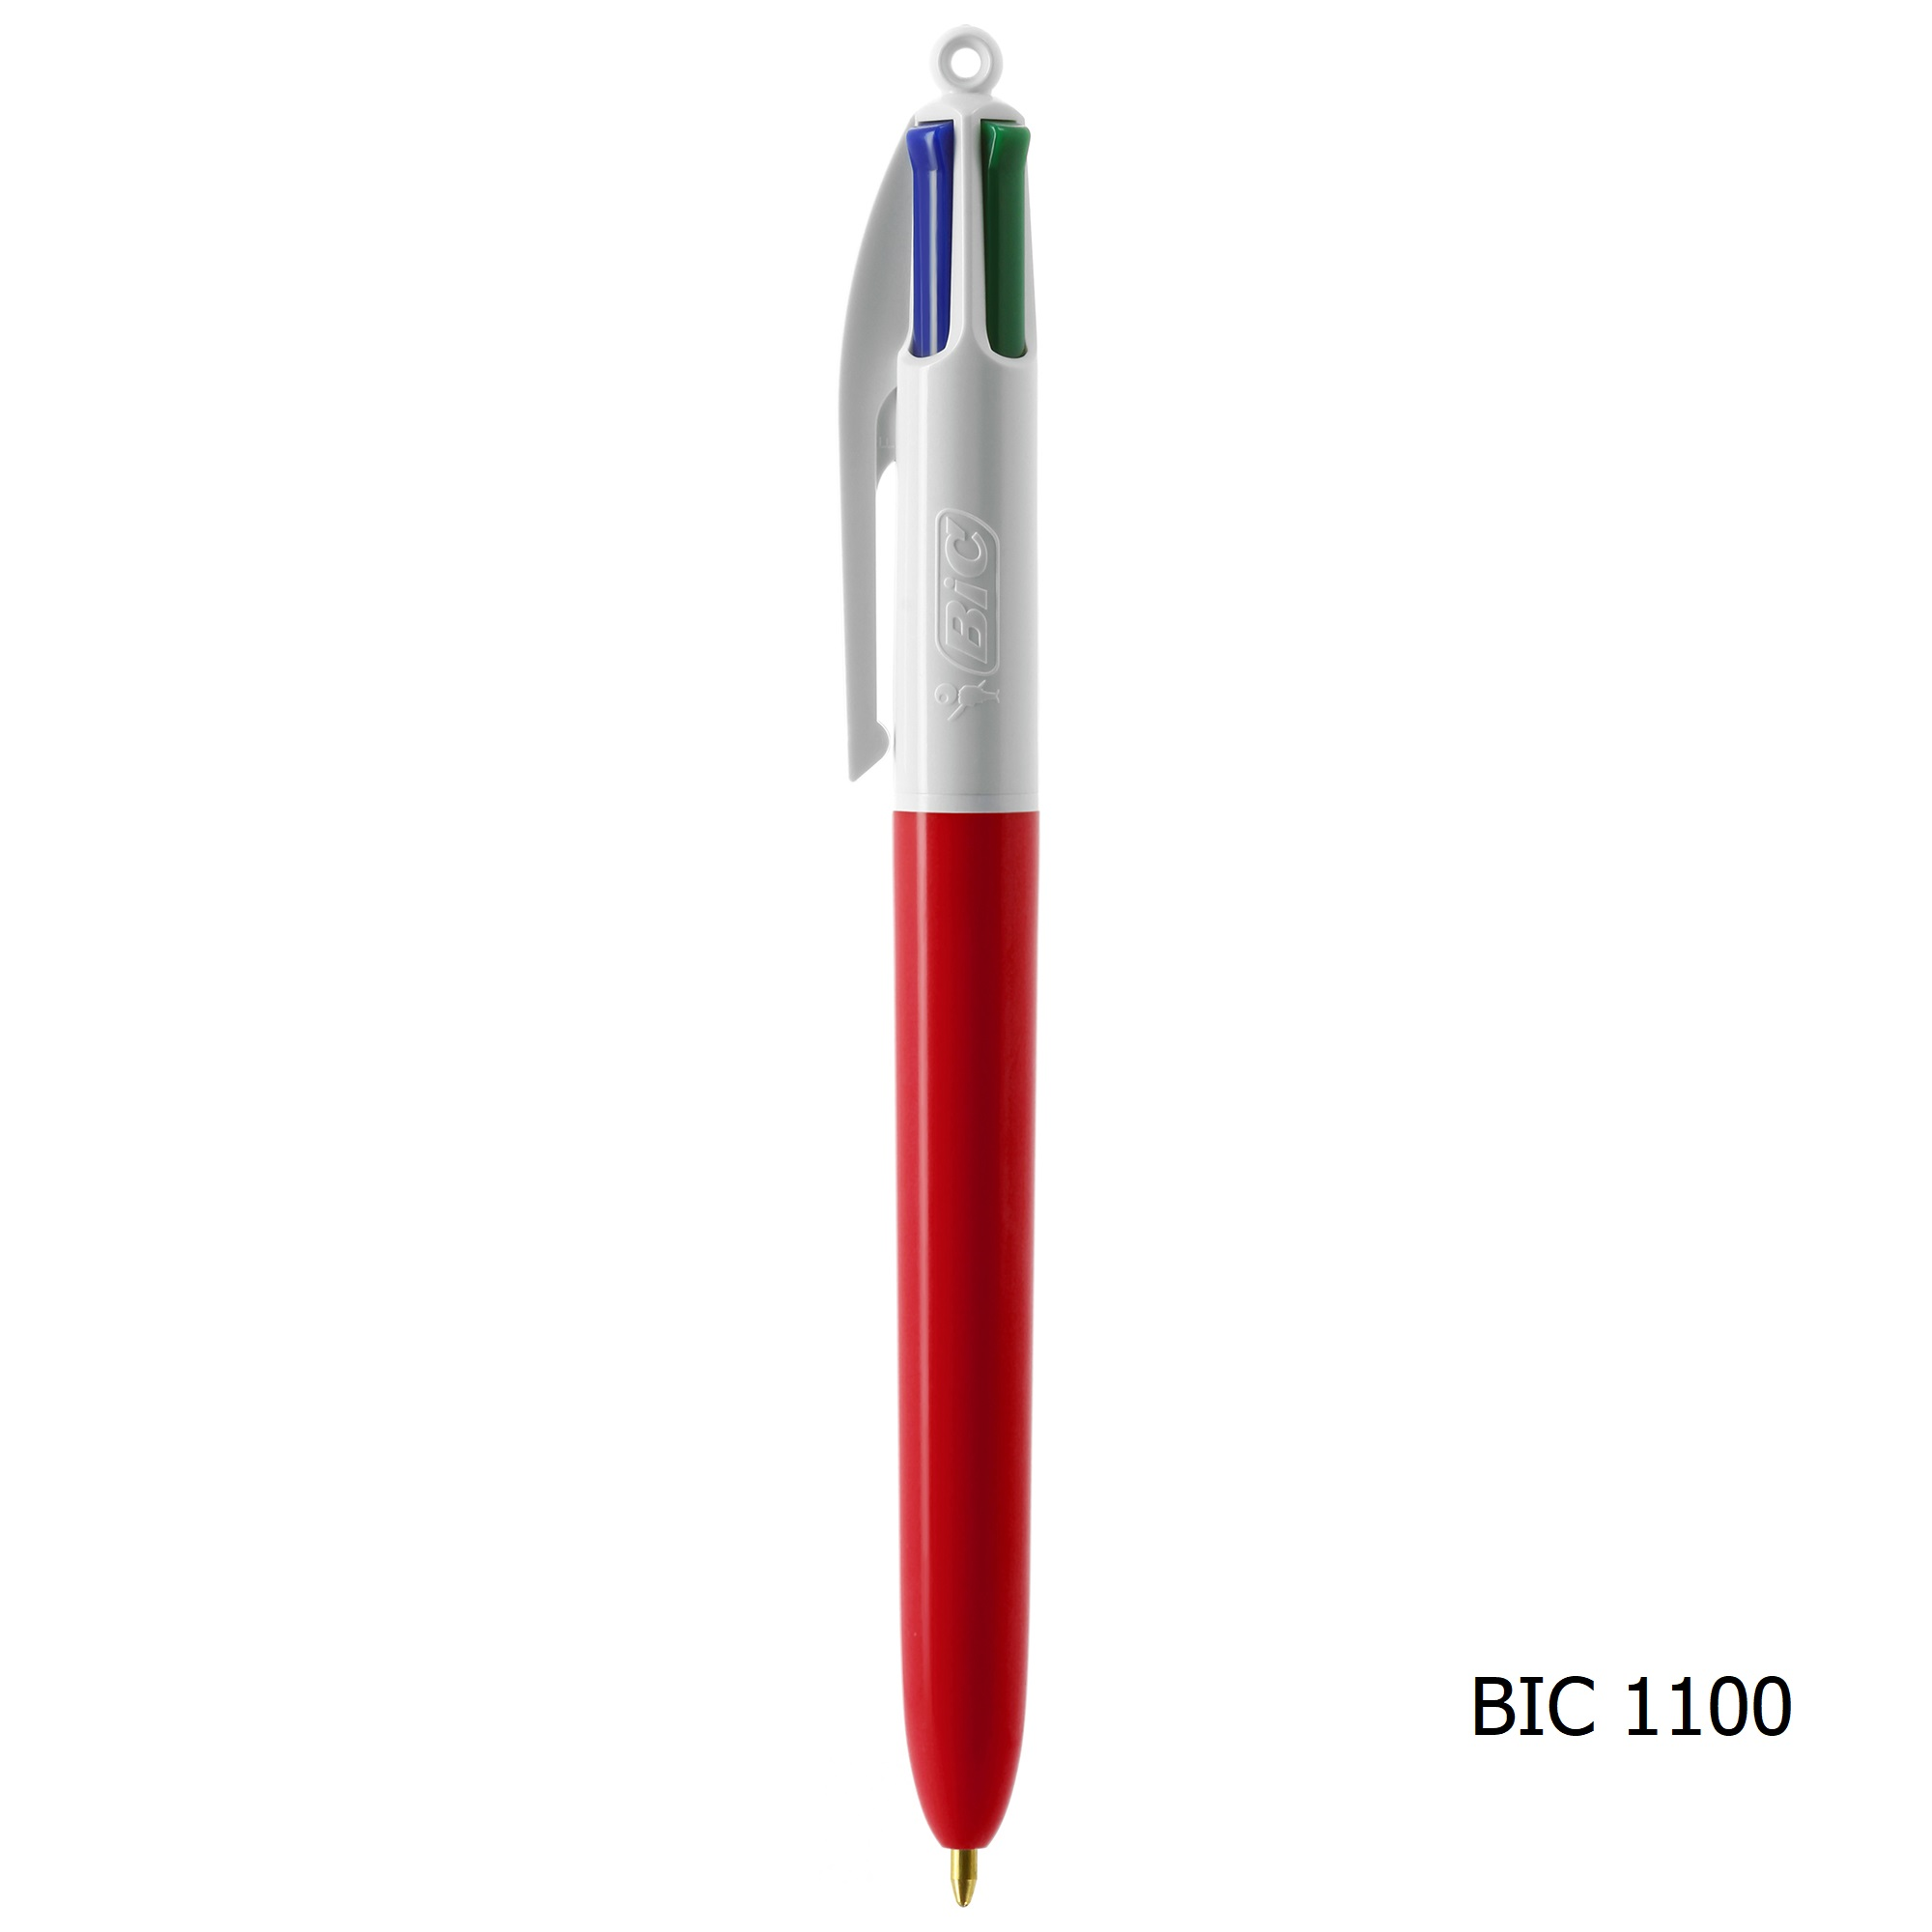 bic-pen-multicolour-1100-3